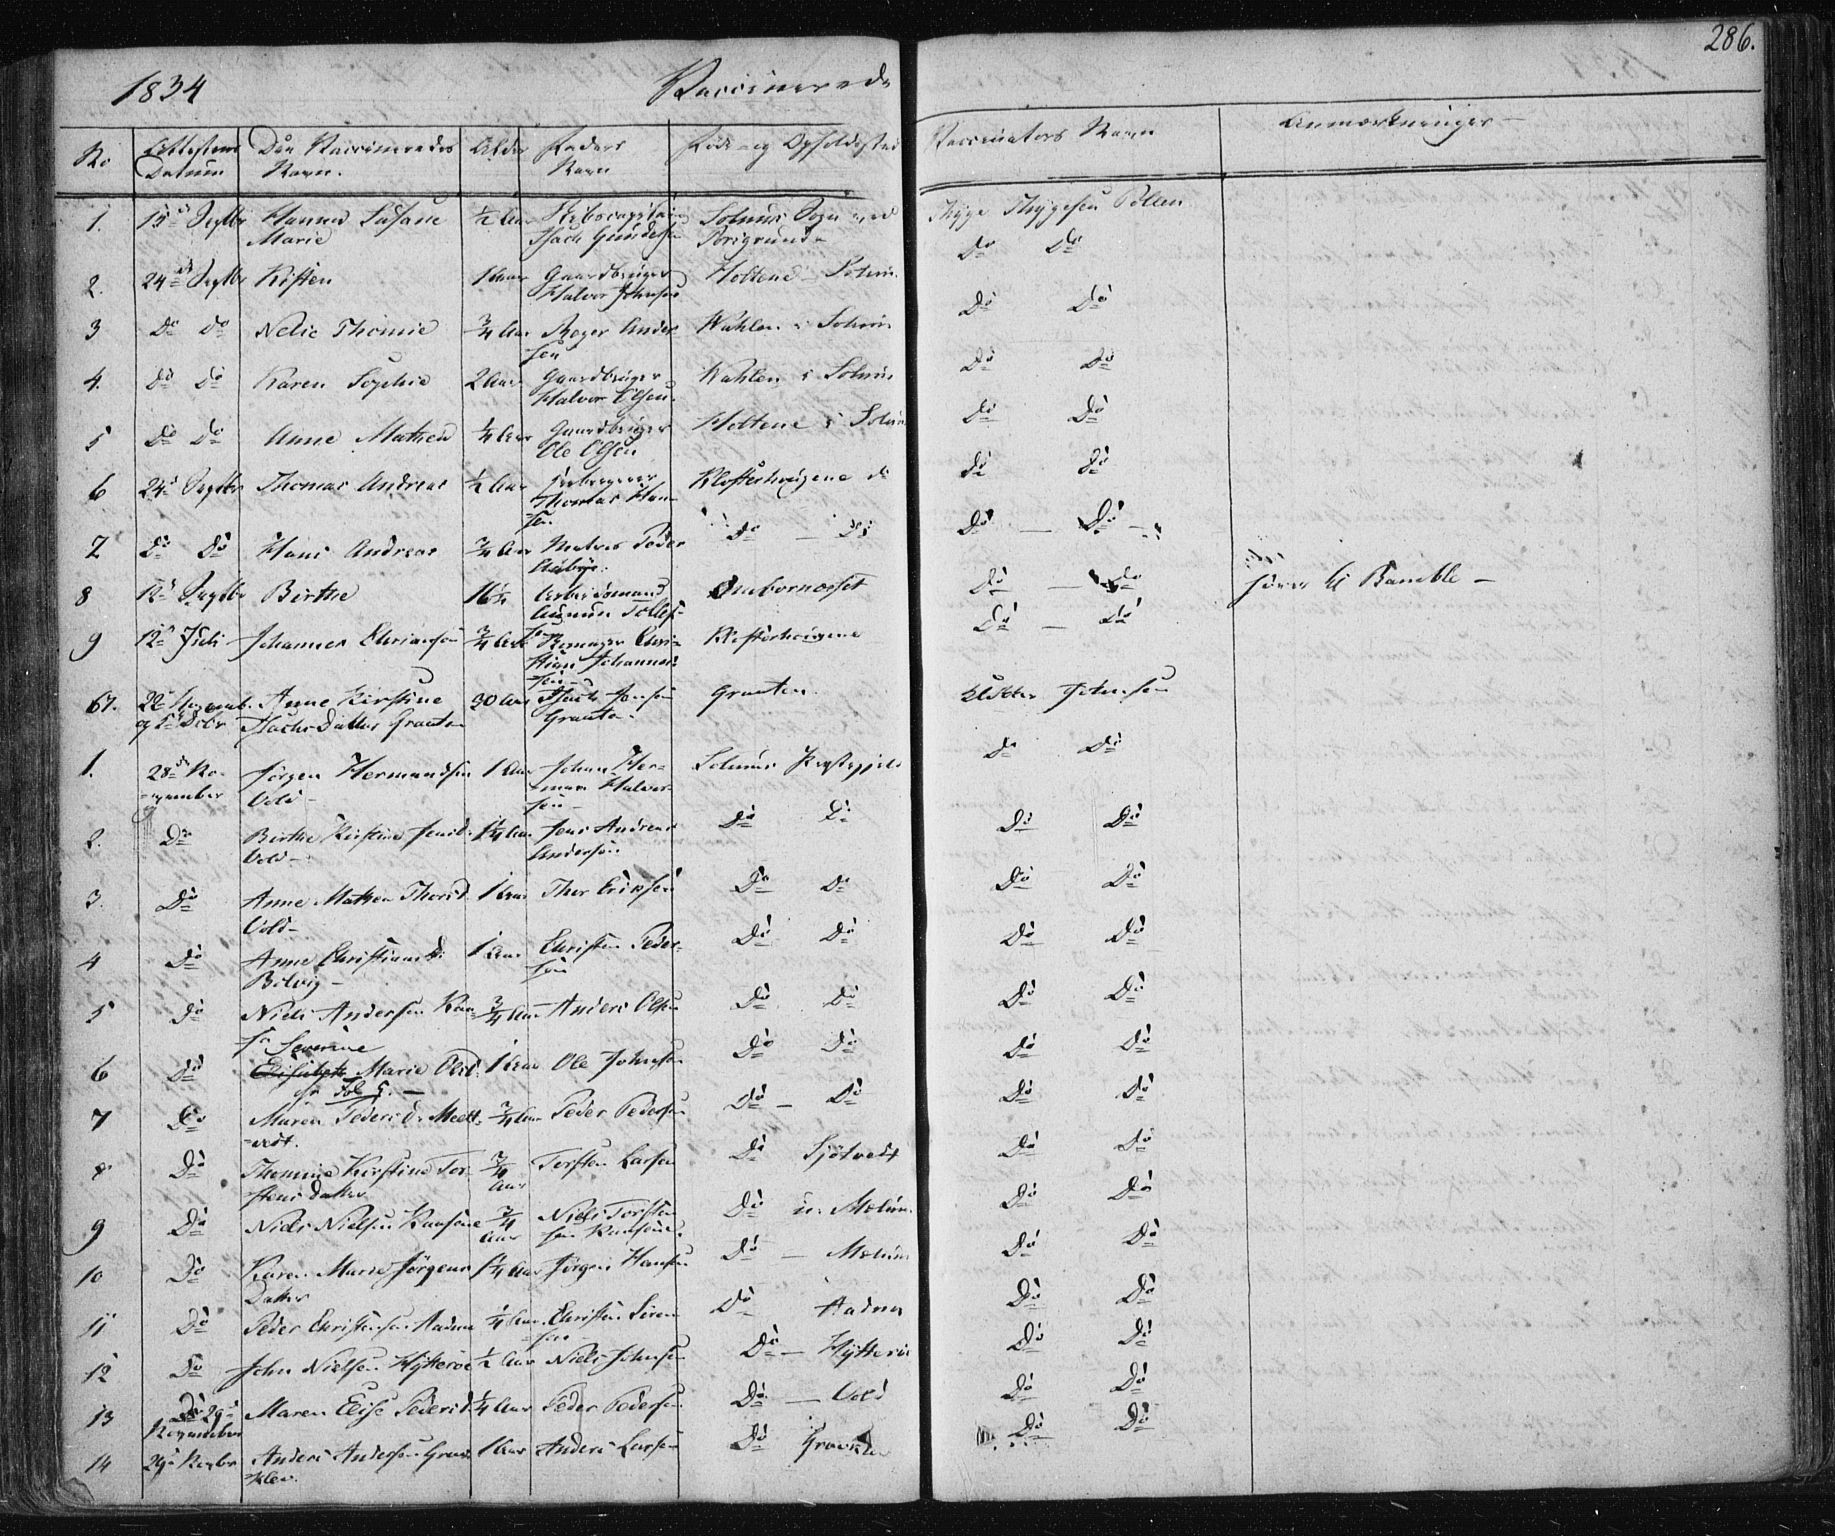 SAKO, Solum kirkebøker, F/Fa/L0005: Ministerialbok nr. I 5, 1833-1843, s. 286